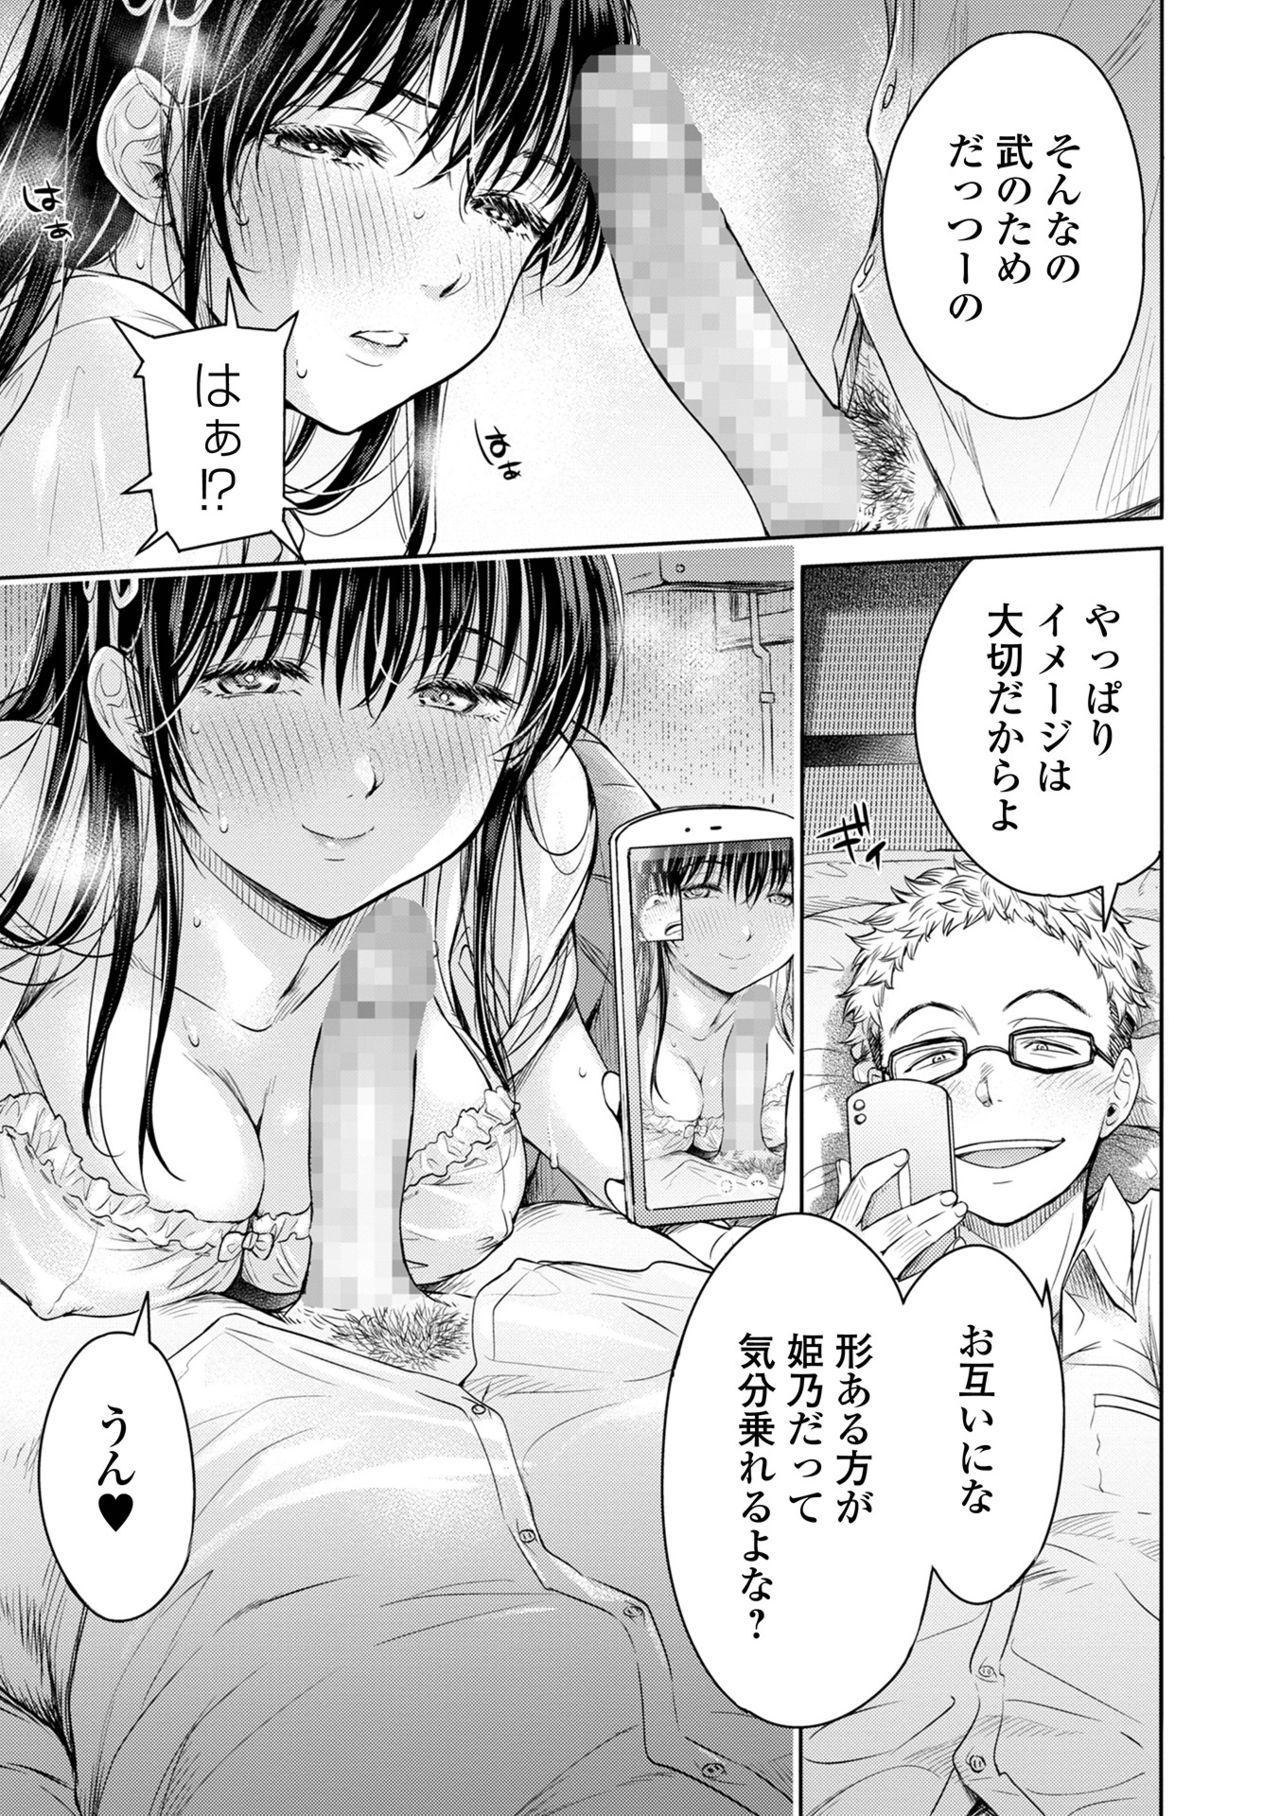 COMIC Shigekiteki SQUIRT!! Vol. 25 24